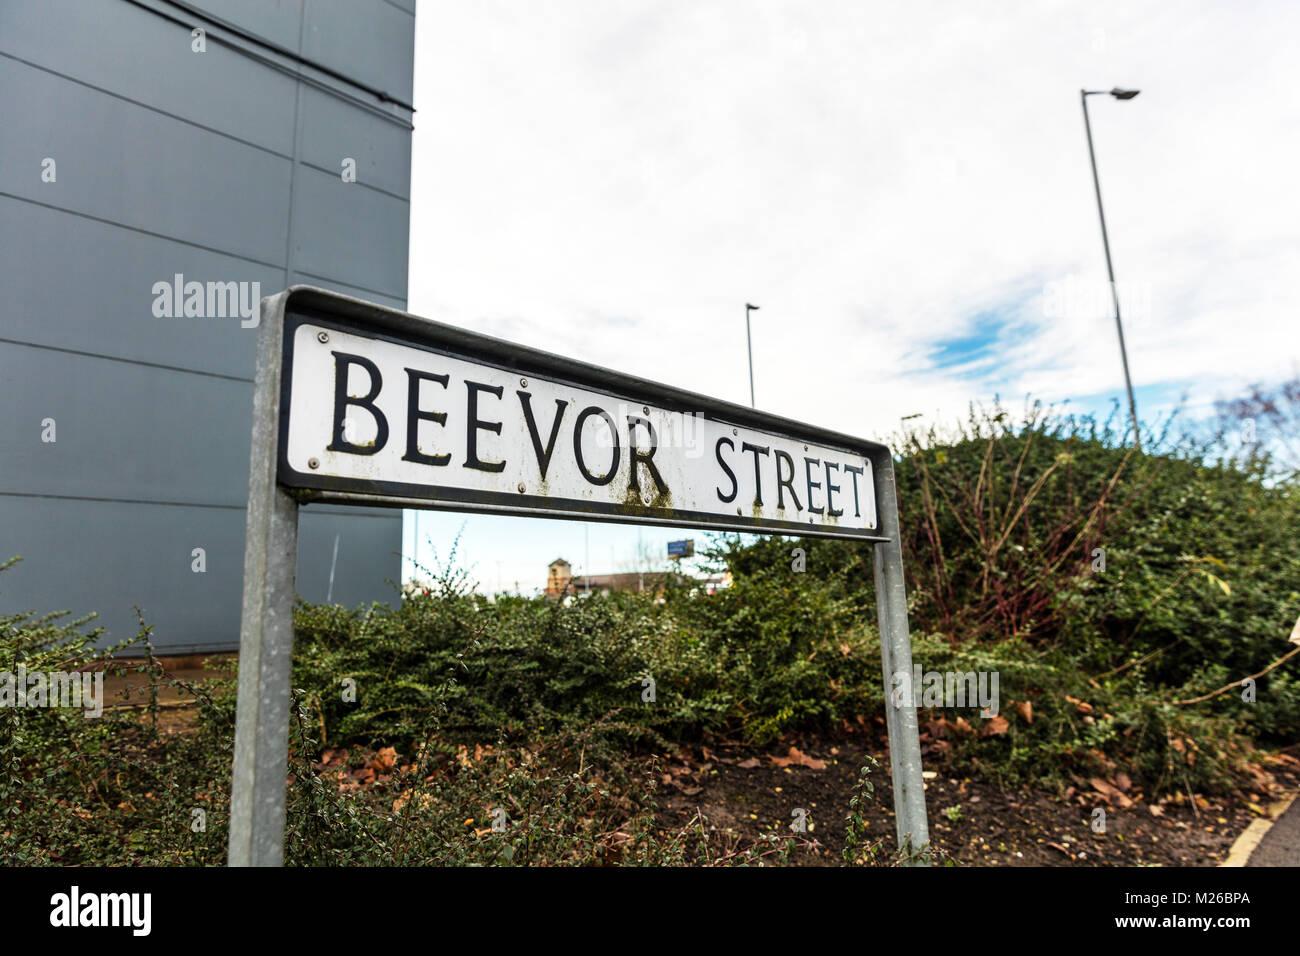 Beevor Street Lincoln City UK England, beaver, funny street names UK, amusing street name UK, funny street name - Stock Image